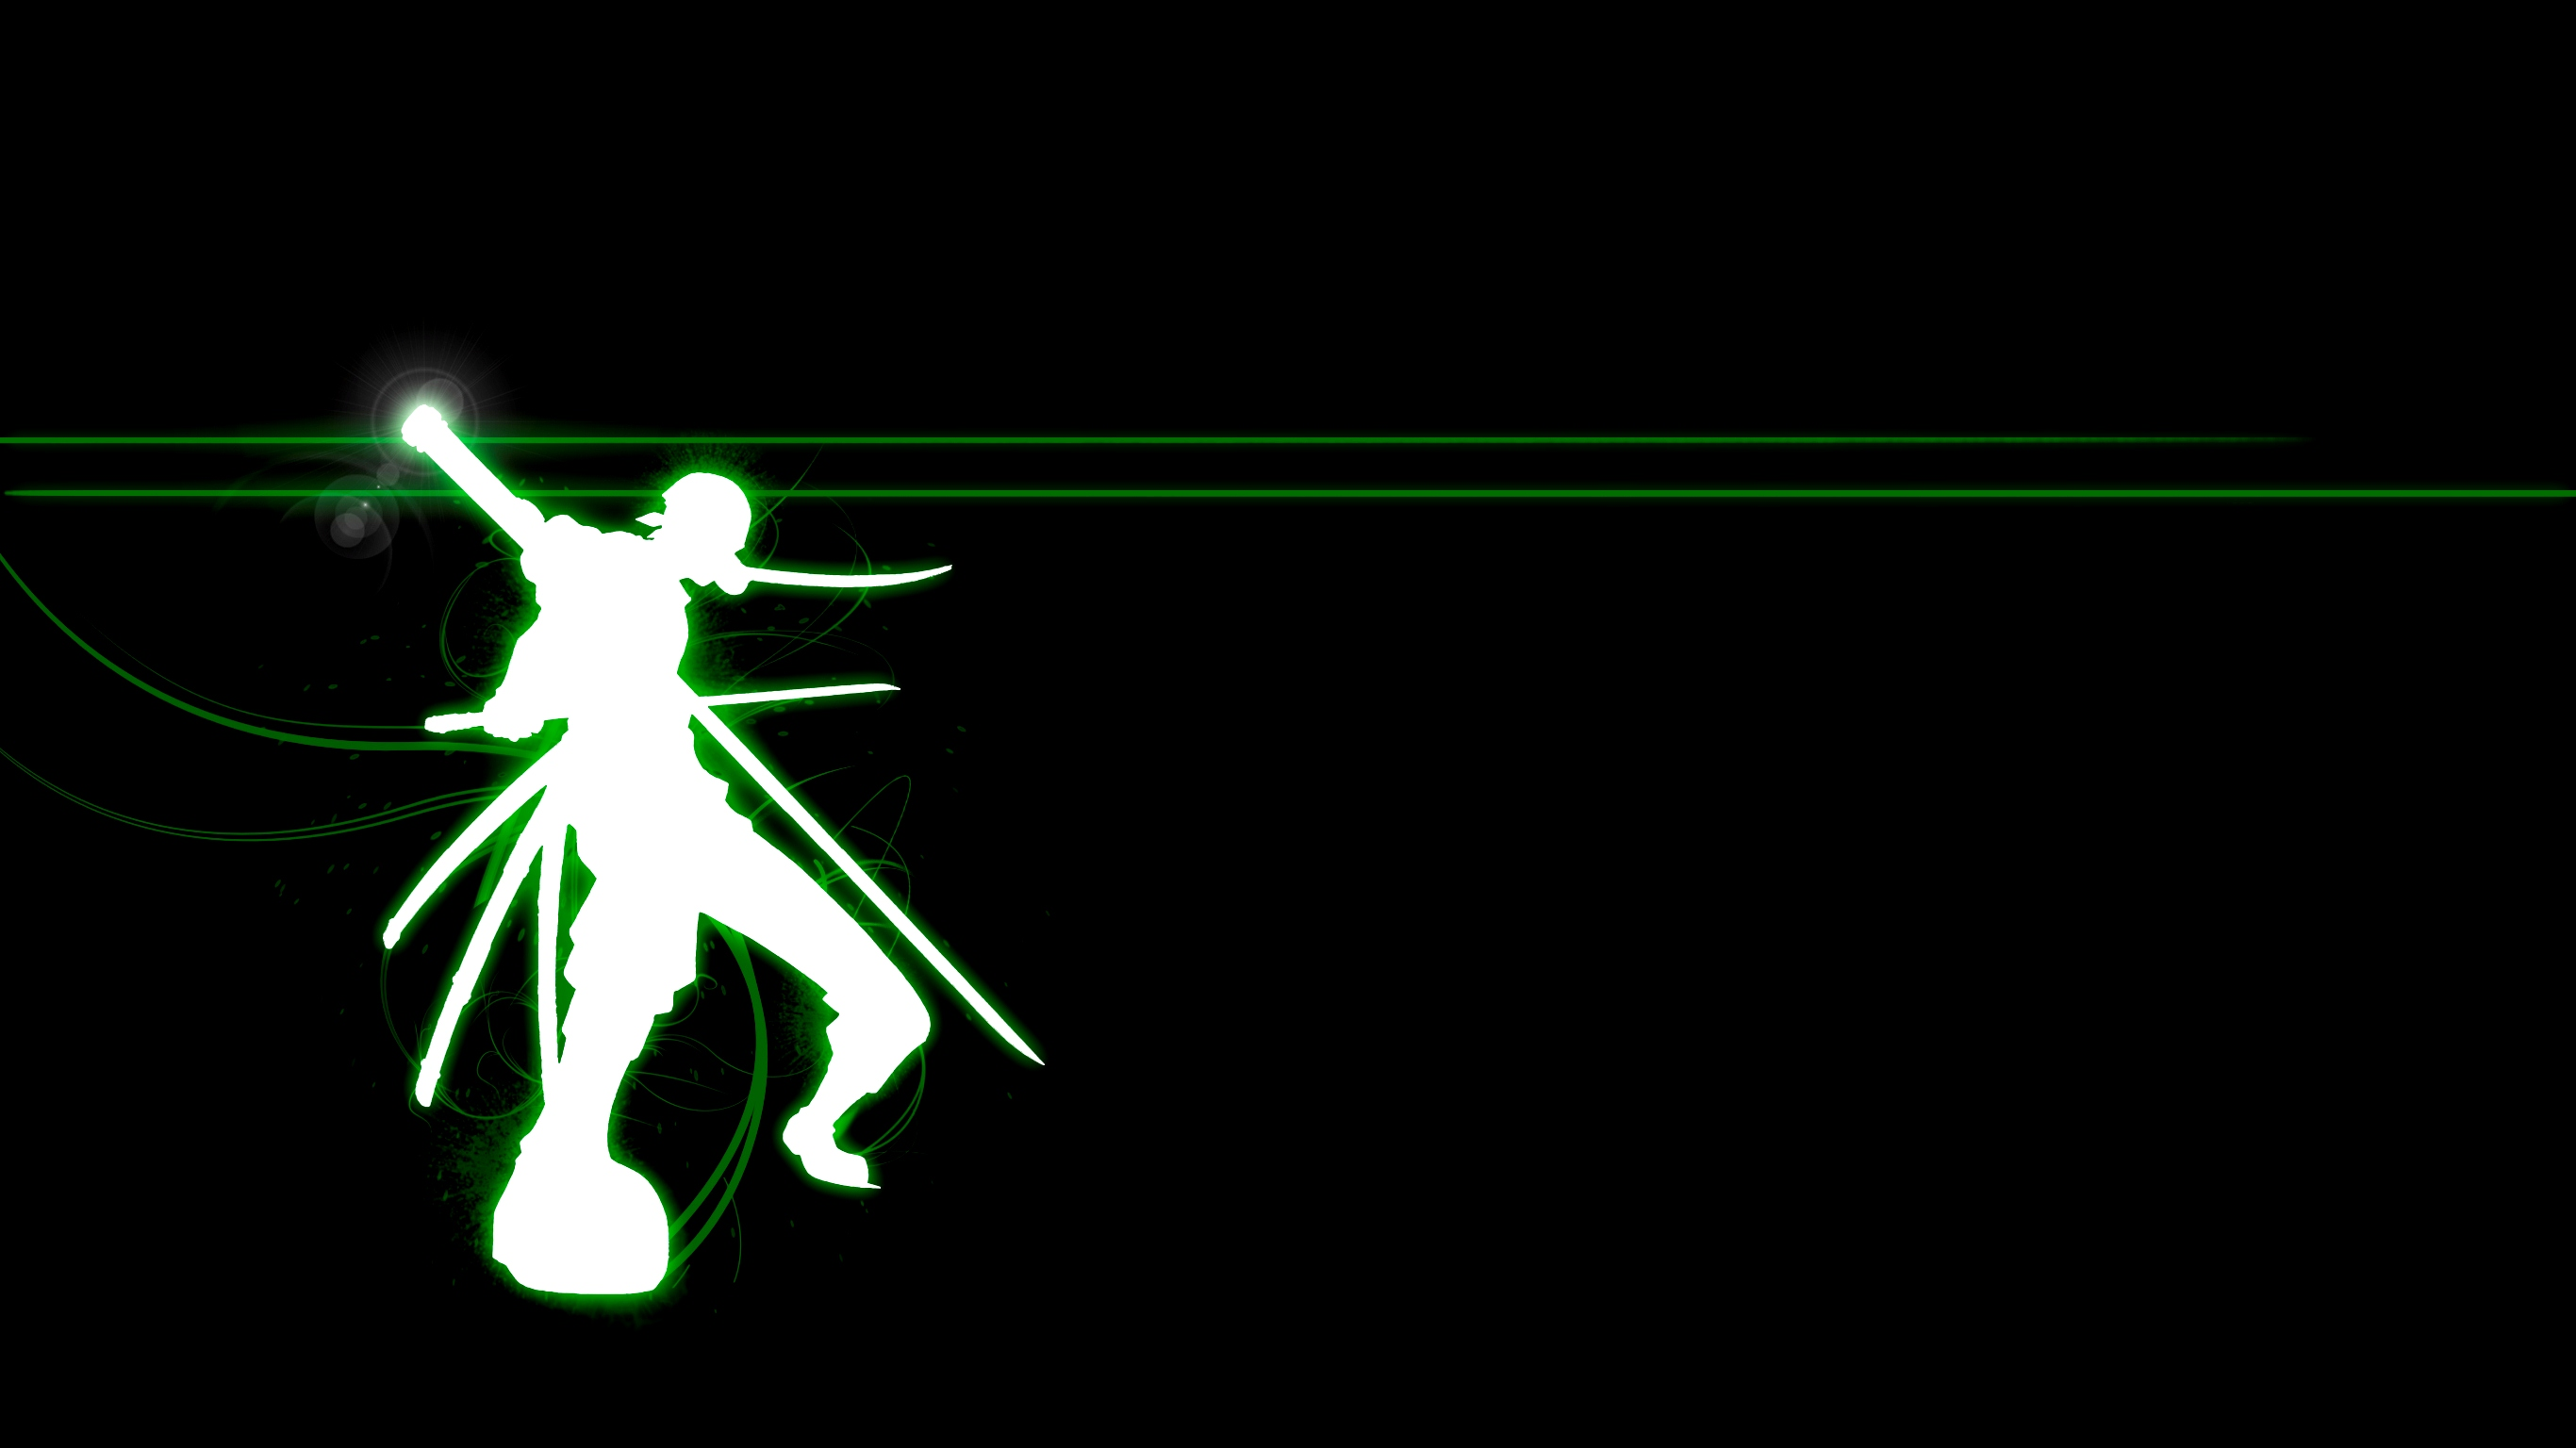 2732x1536 Silhouette Roronoa Zoro Black Wallpaper Anime